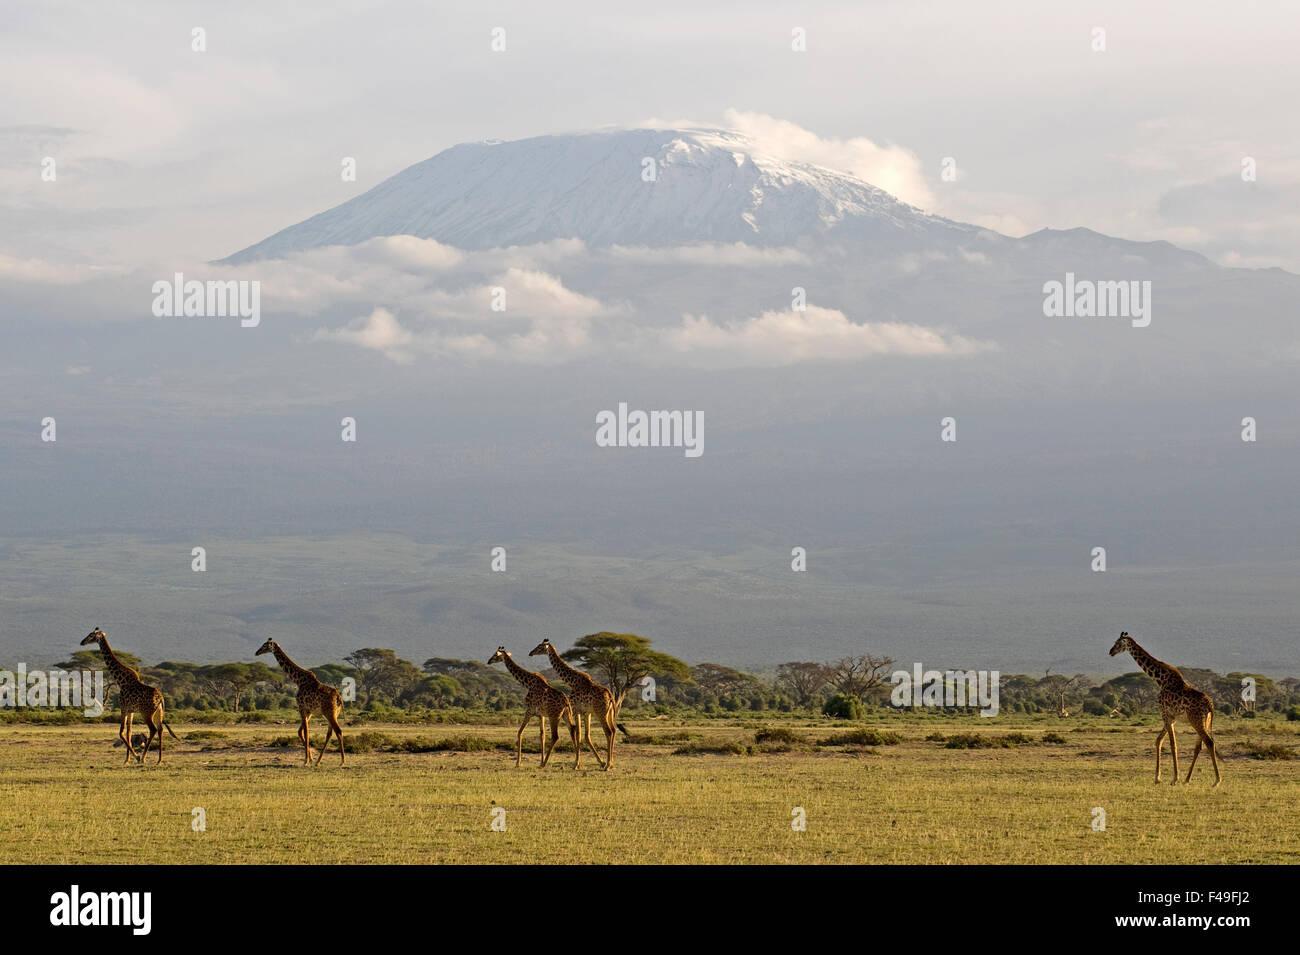 Rothschild's giraffe group with Mount Kilimanjaro in the background. Amboseli National Park, Kenya, Africa - Stock Image